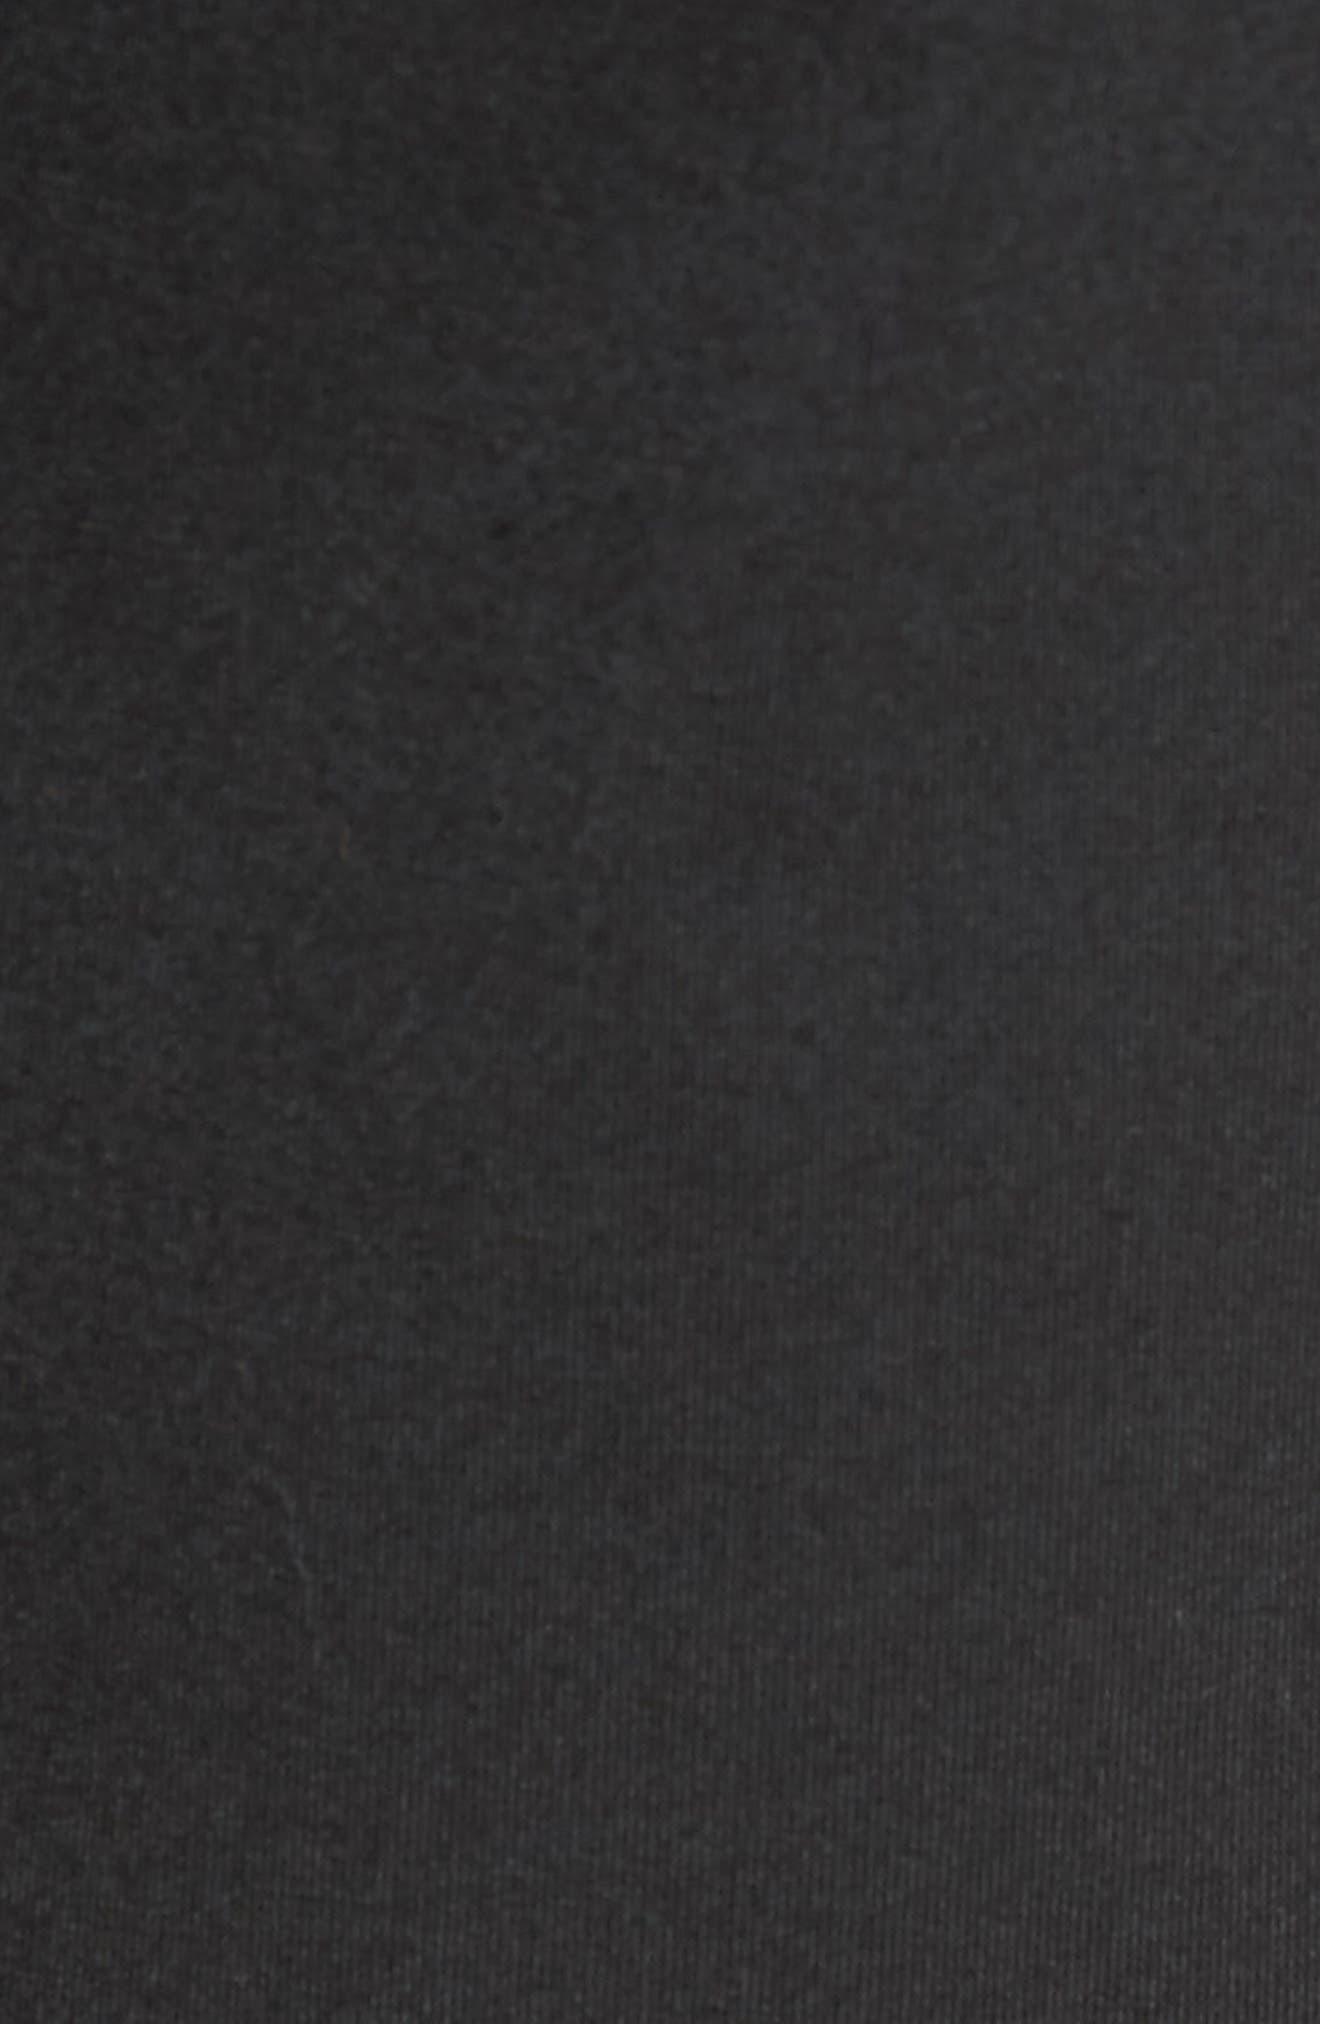 VA Sport II Shorts,                             Alternate thumbnail 5, color,                             001